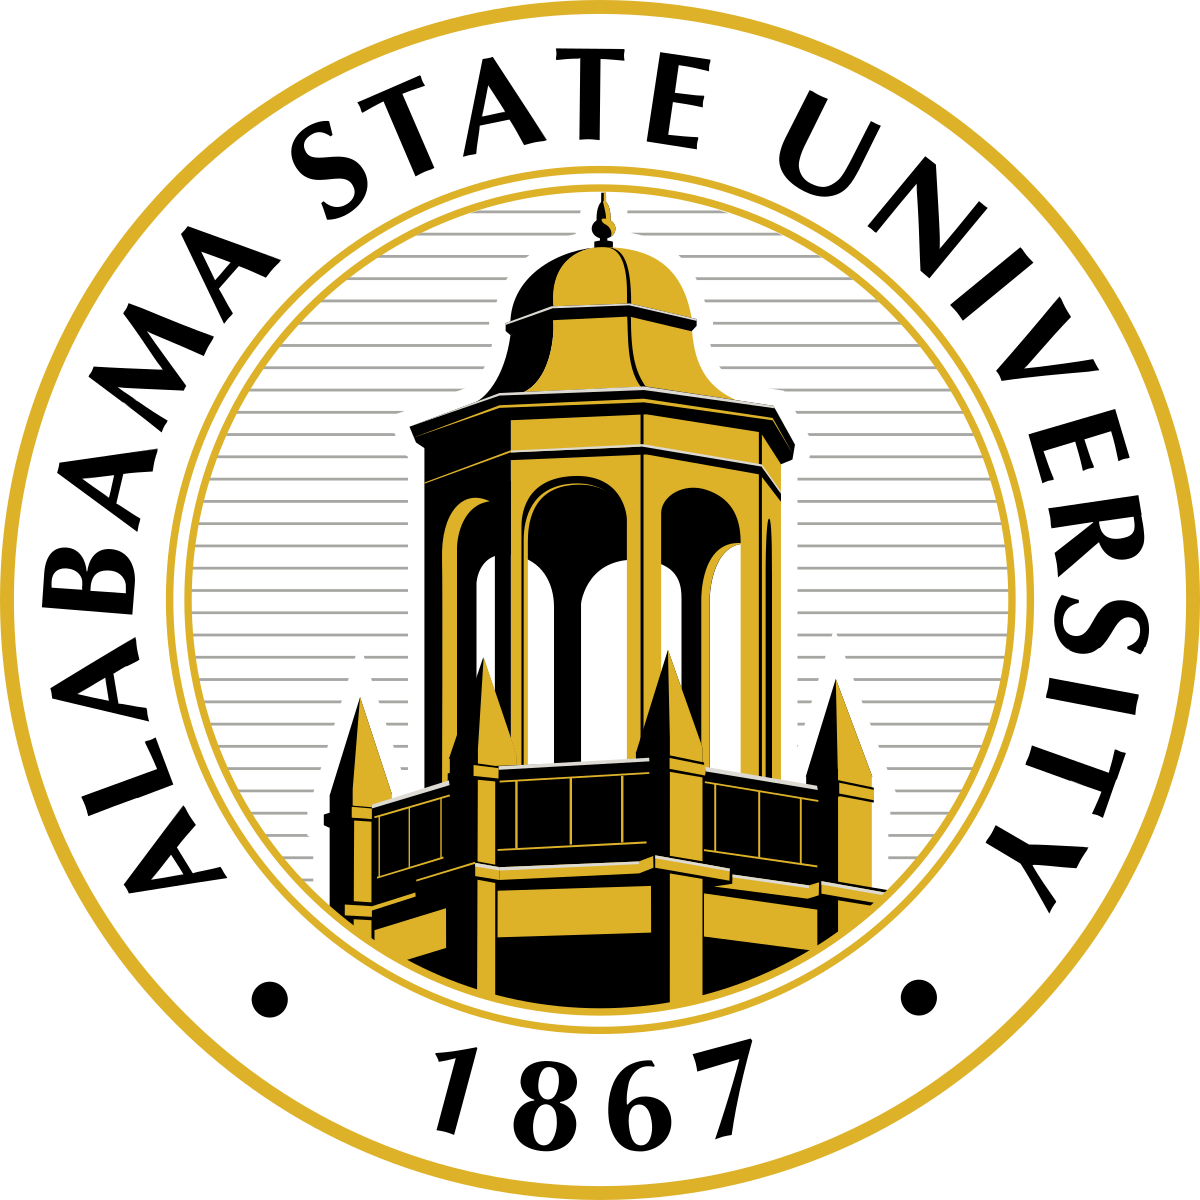 University of alabama football clipart clip art freeuse download Alabama State University - Wikipedia clip art freeuse download